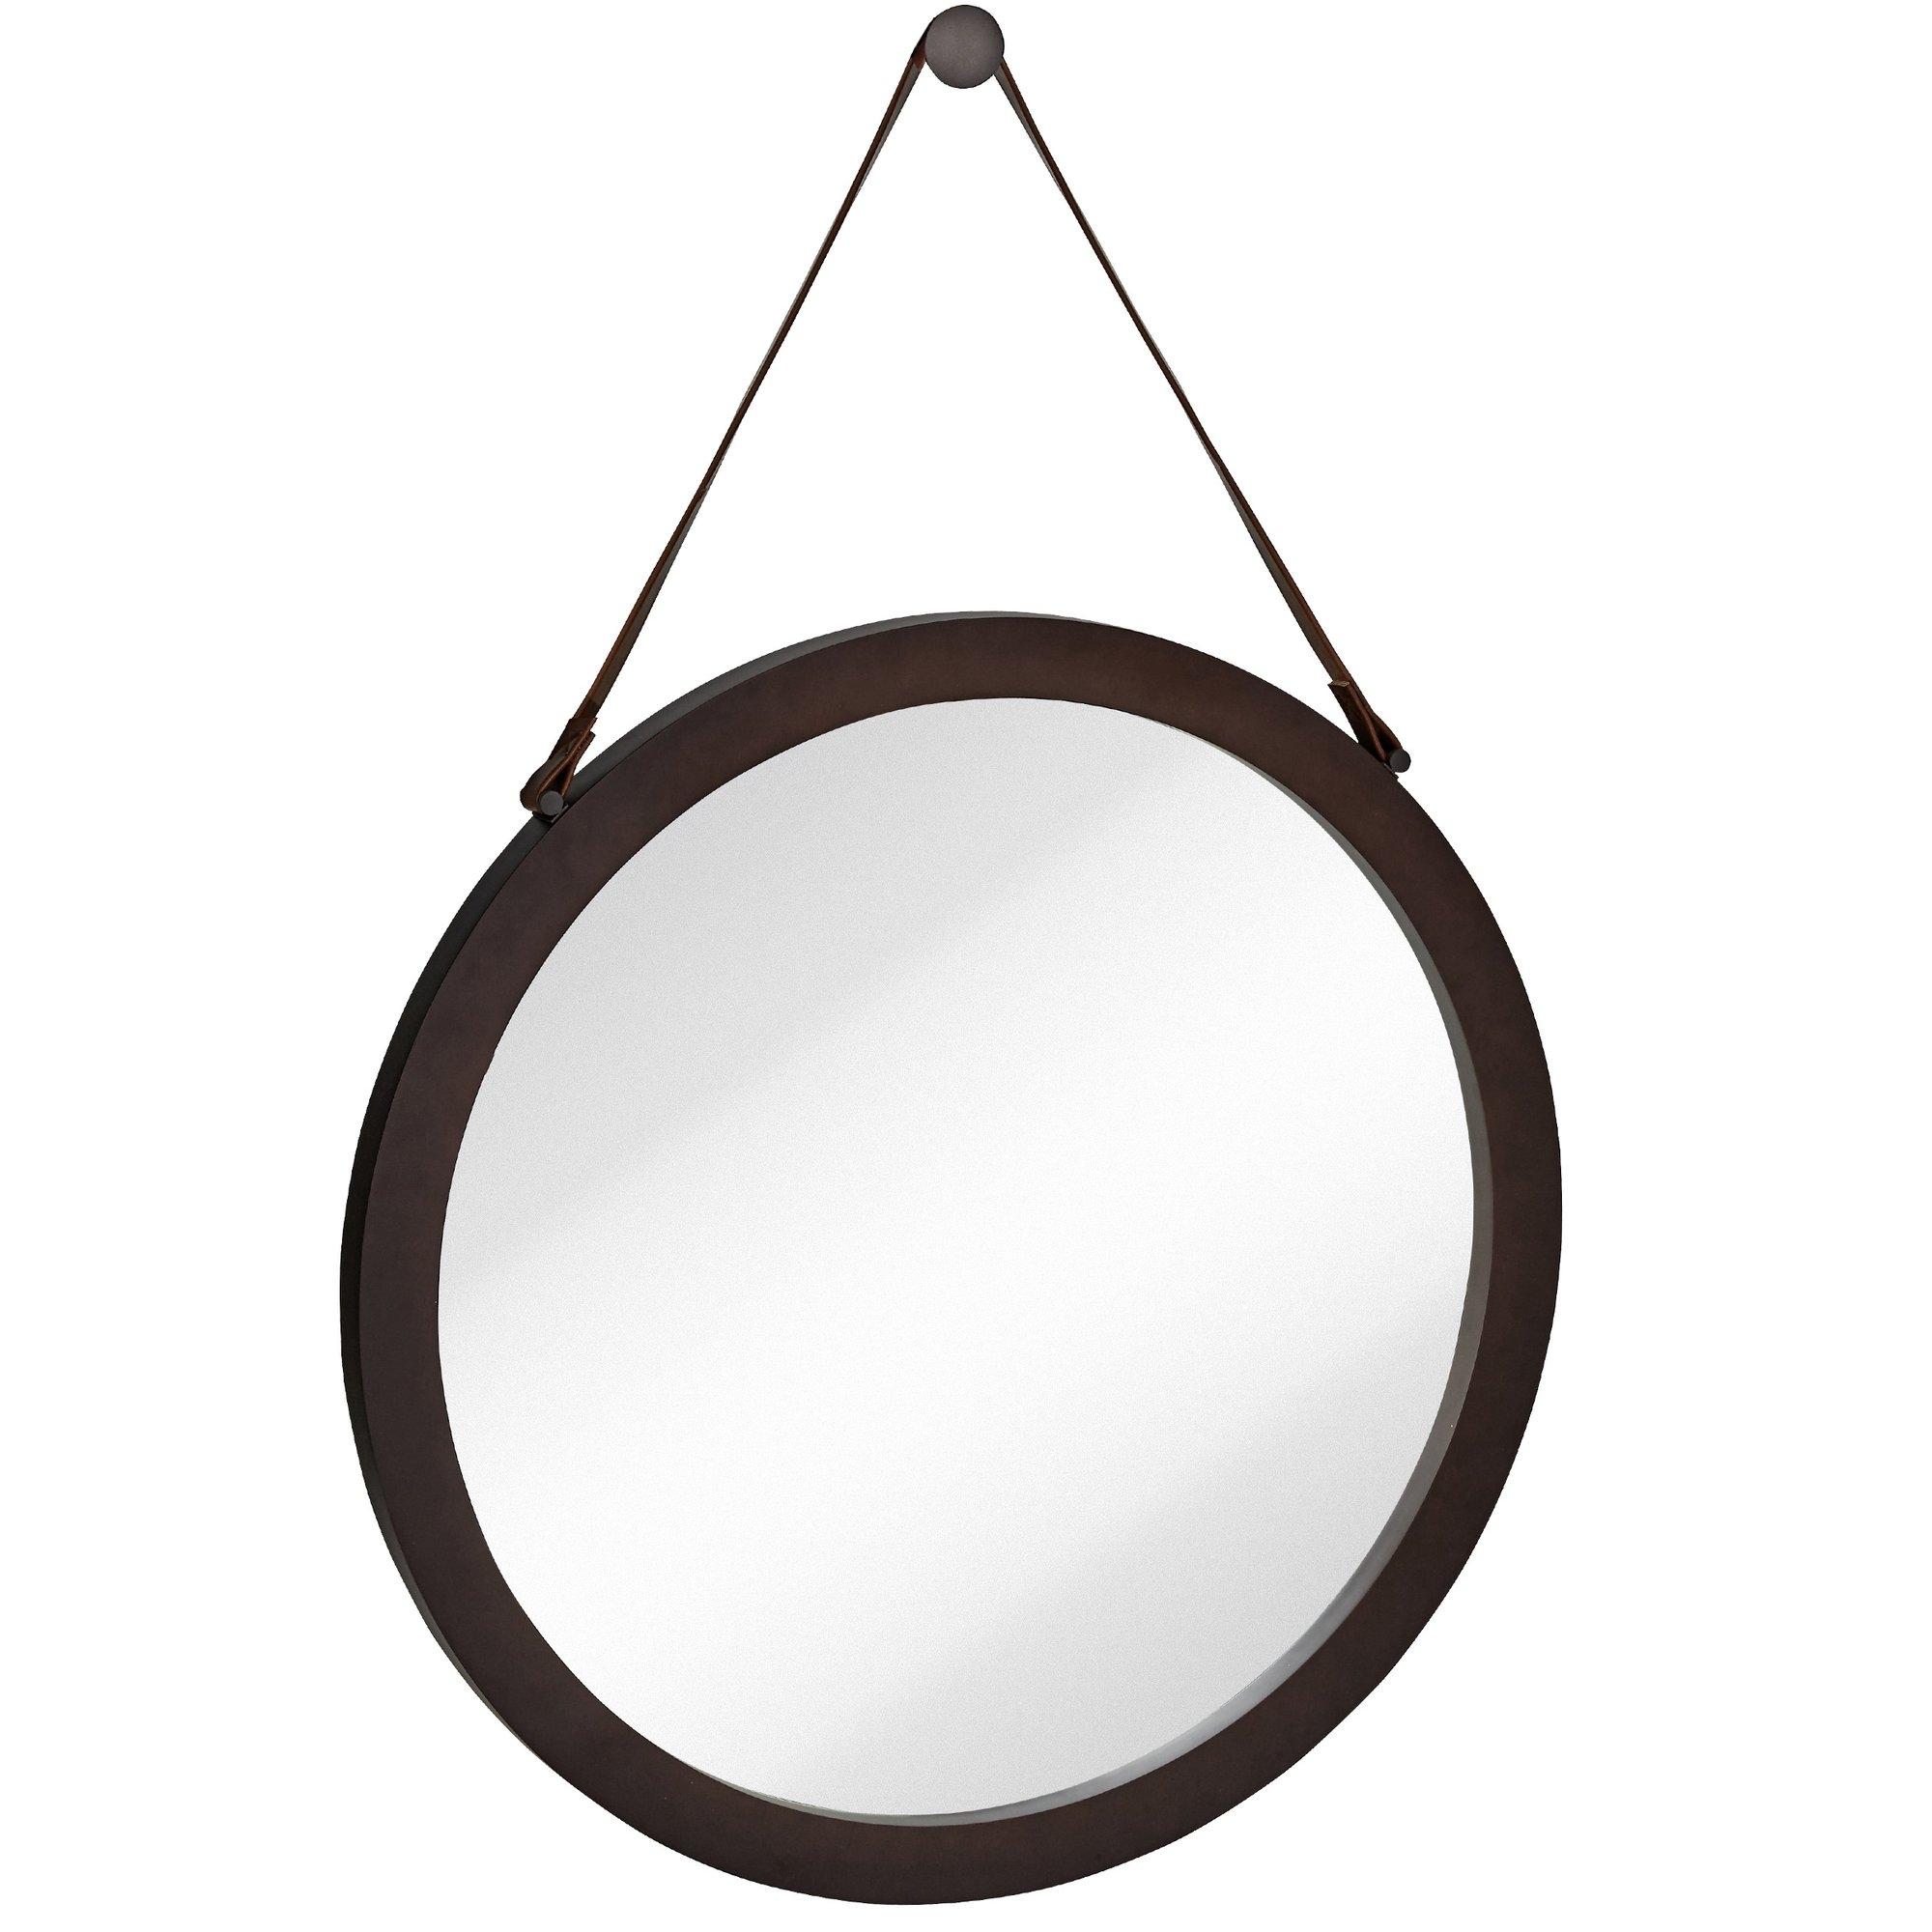 Majestic Mirror Round Urban Modern Leather Strap Decorative In Round Leather Mirror (View 7 of 15)